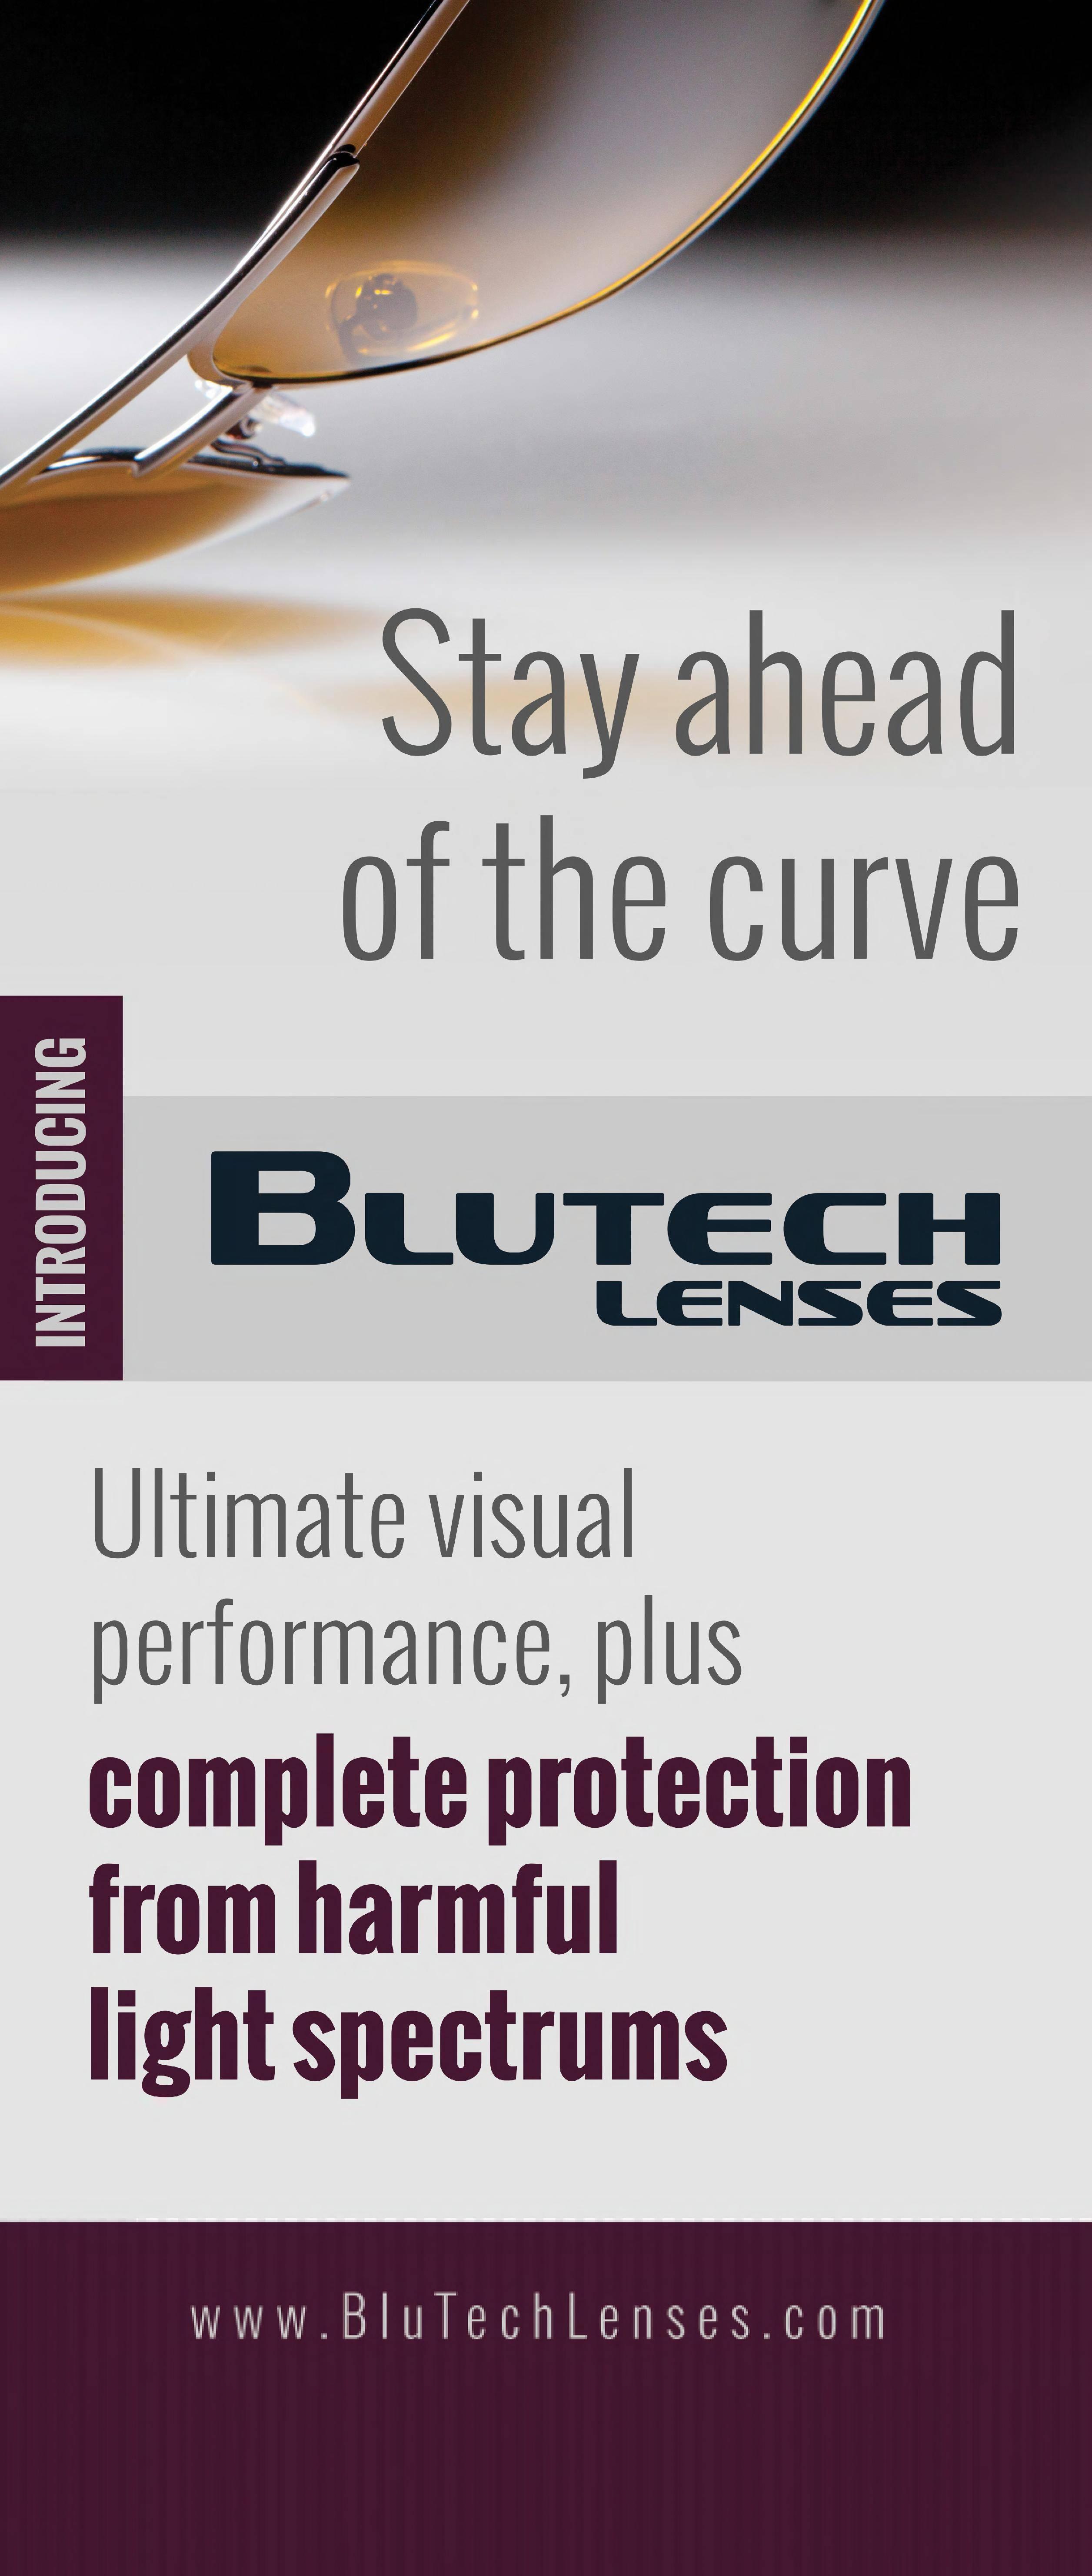 bluetech lenses for computer protection